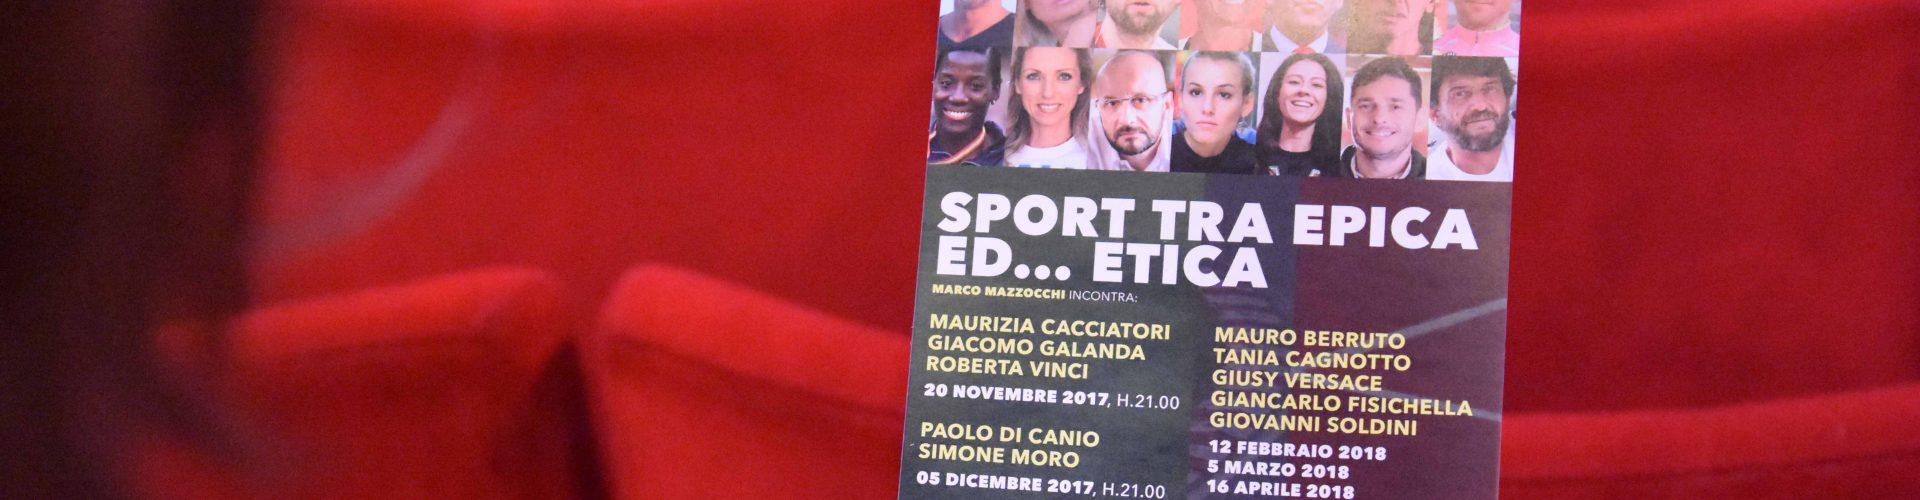 Sport fra epica ed etica